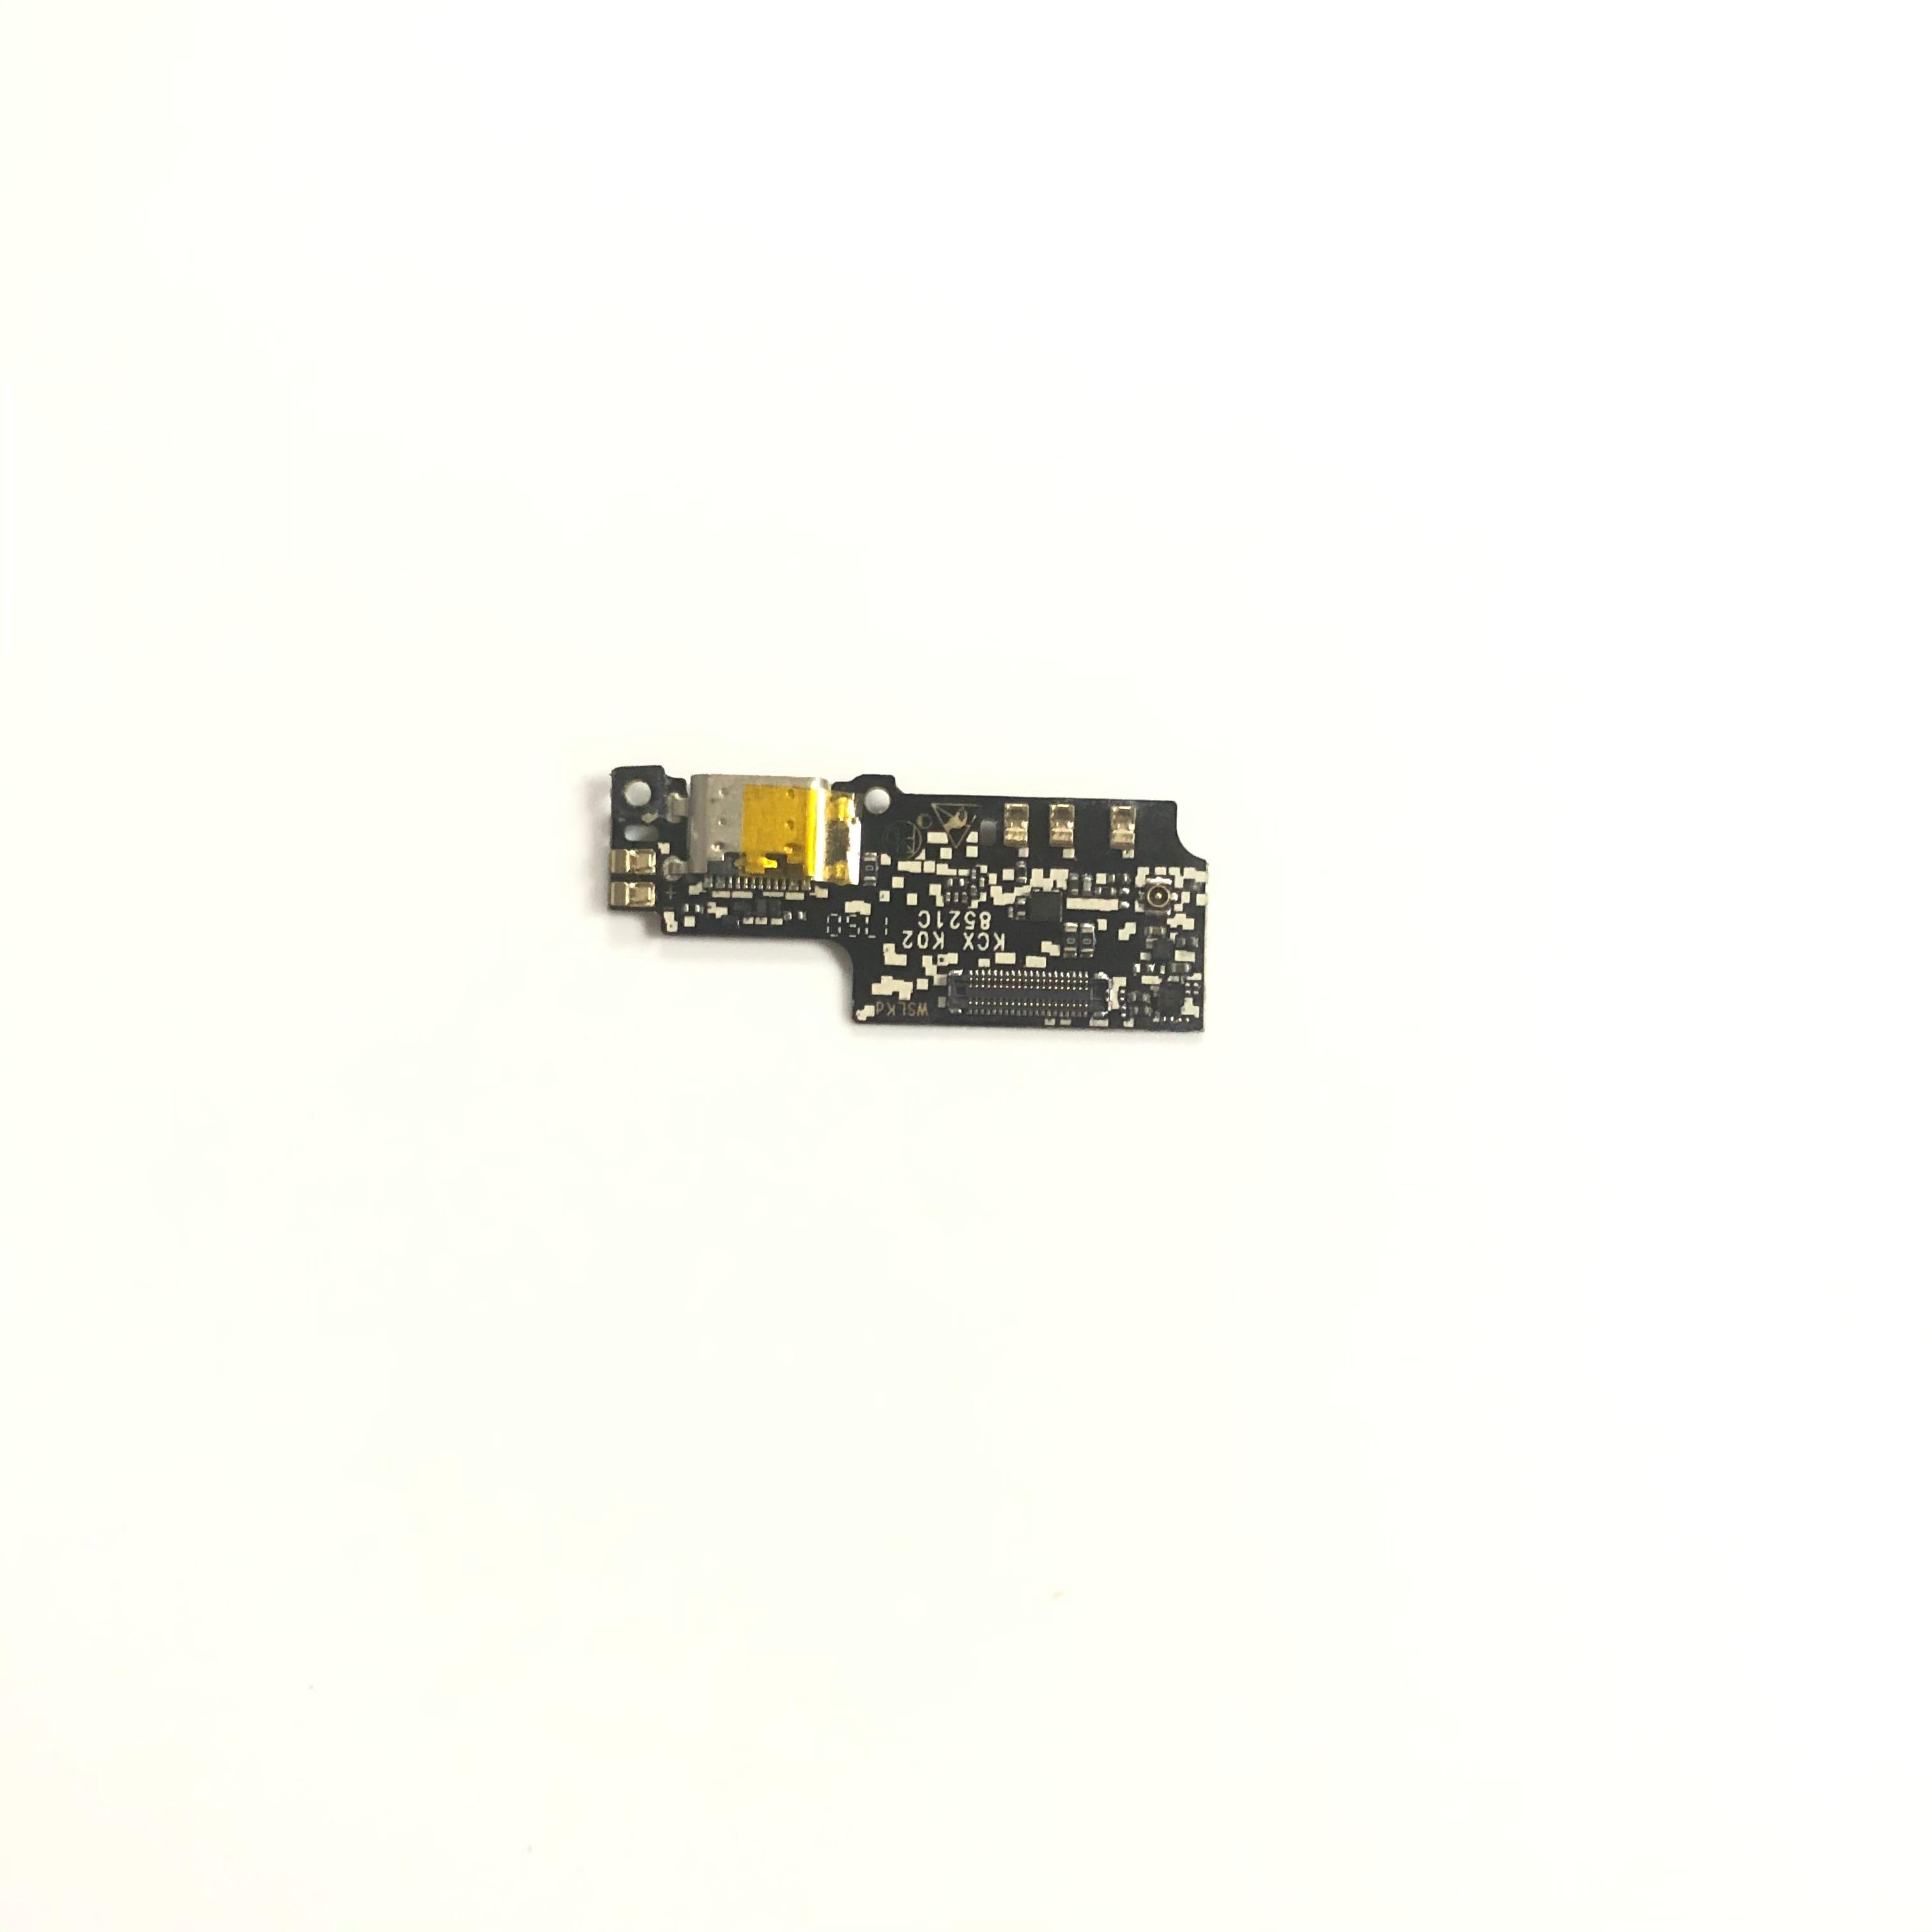 "Tablero de carga de enchufe USB usado para Blackview S8 MT6750T Octa Core 5,7 ""189 HD + pantalla infinita 1440x720 Smartphone"